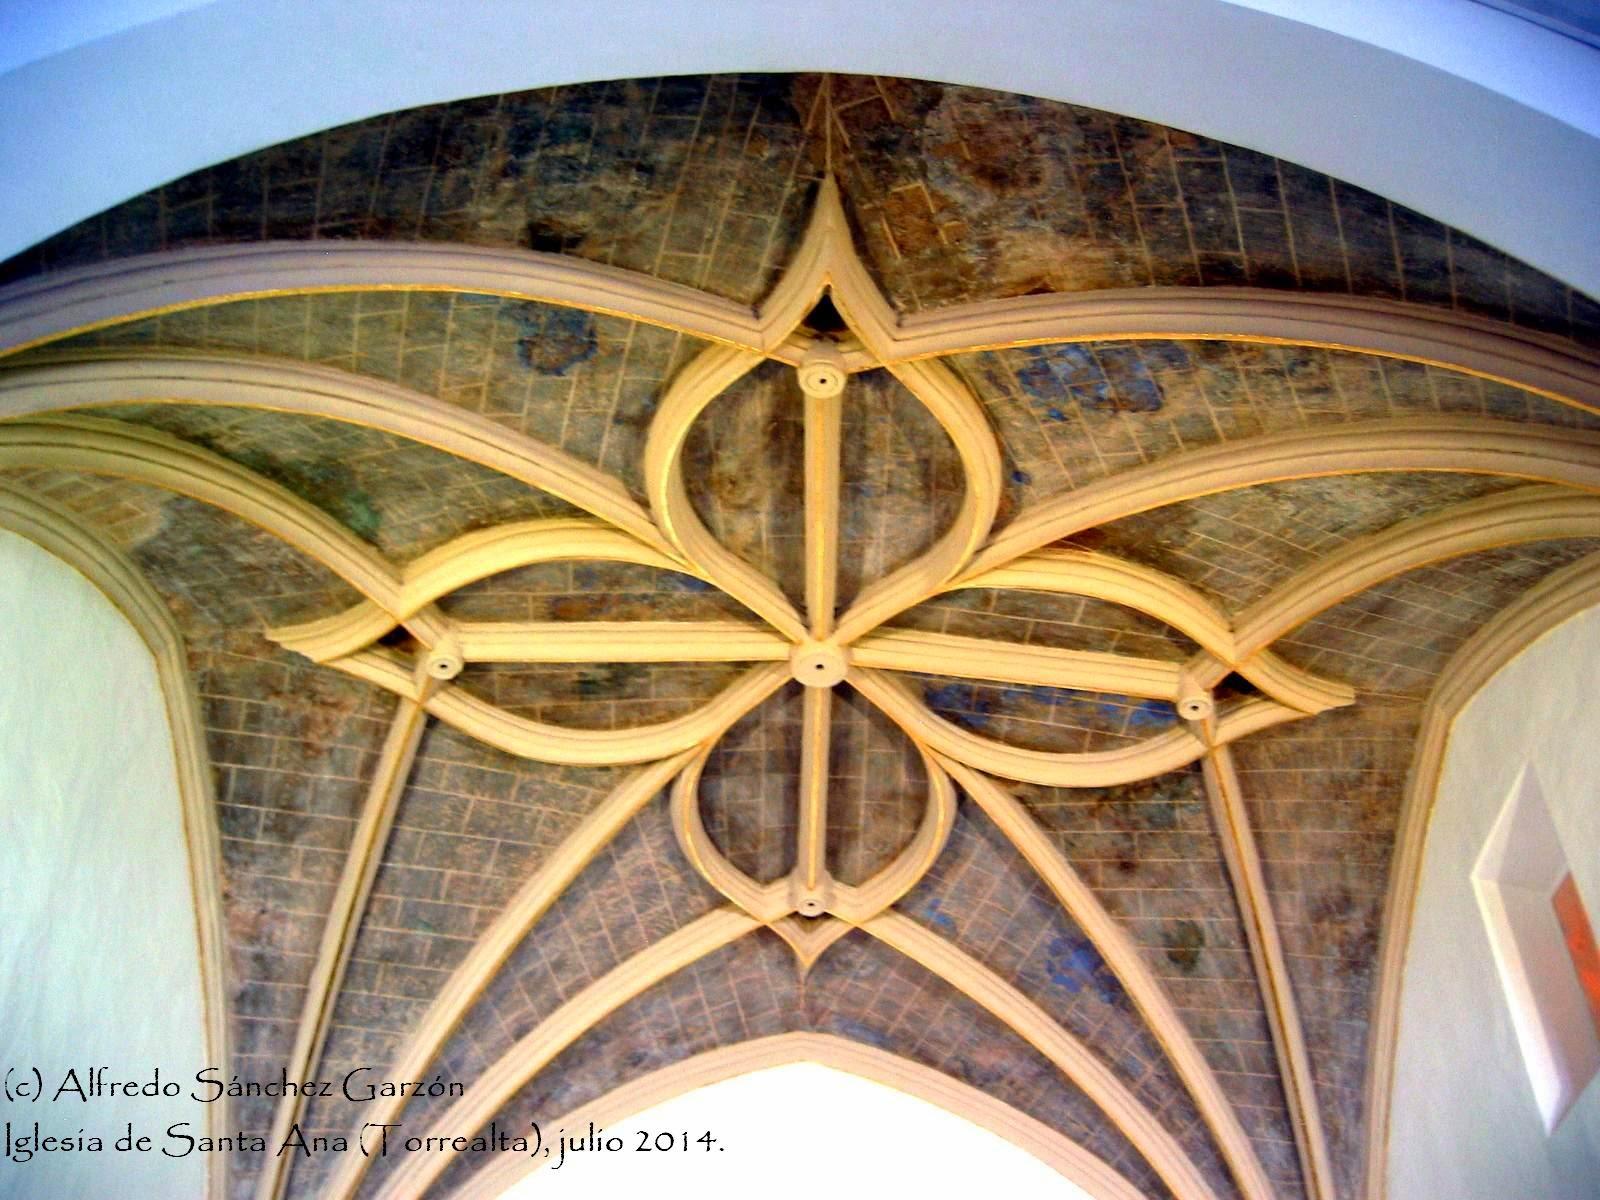 iglesia-santa-ana-torrealta-cupula